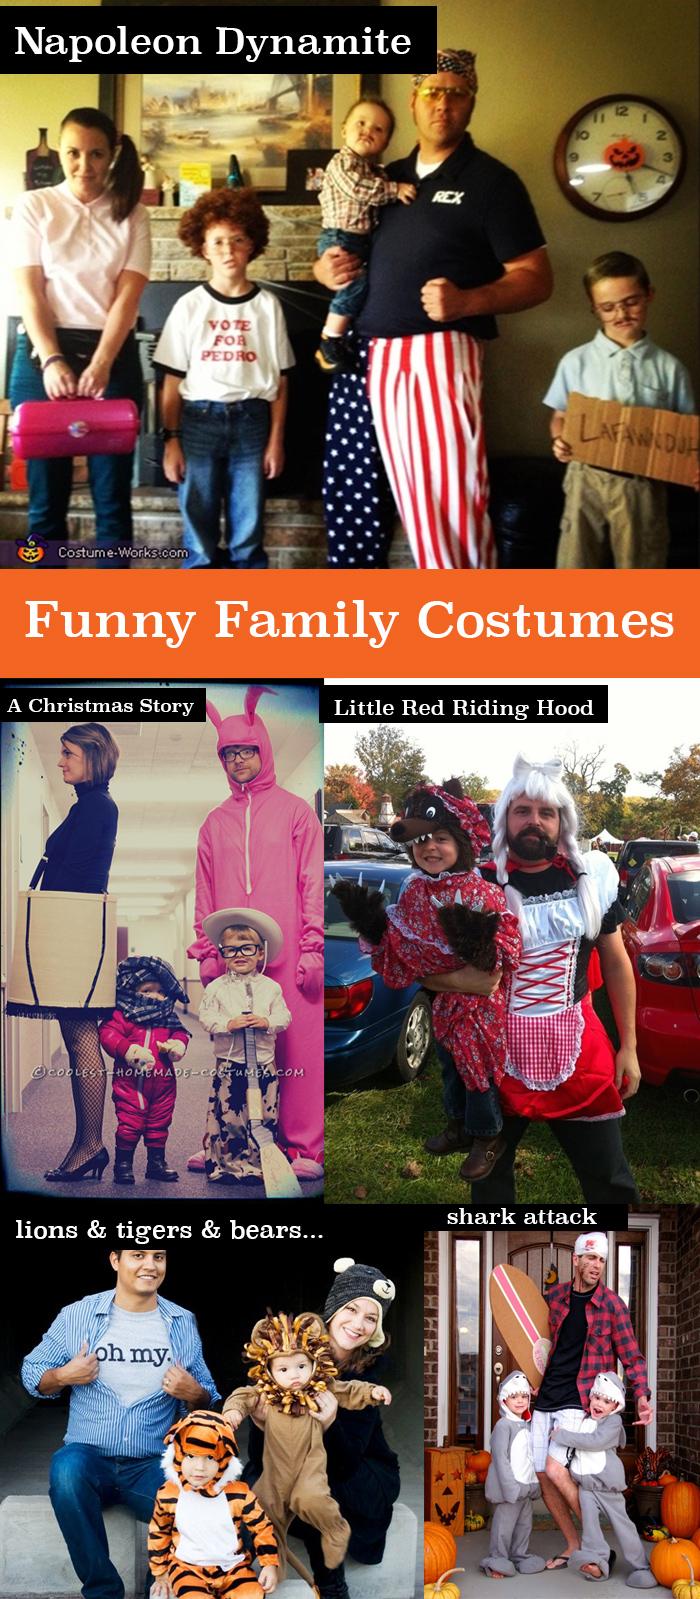 Hilarious family halloween costumes!